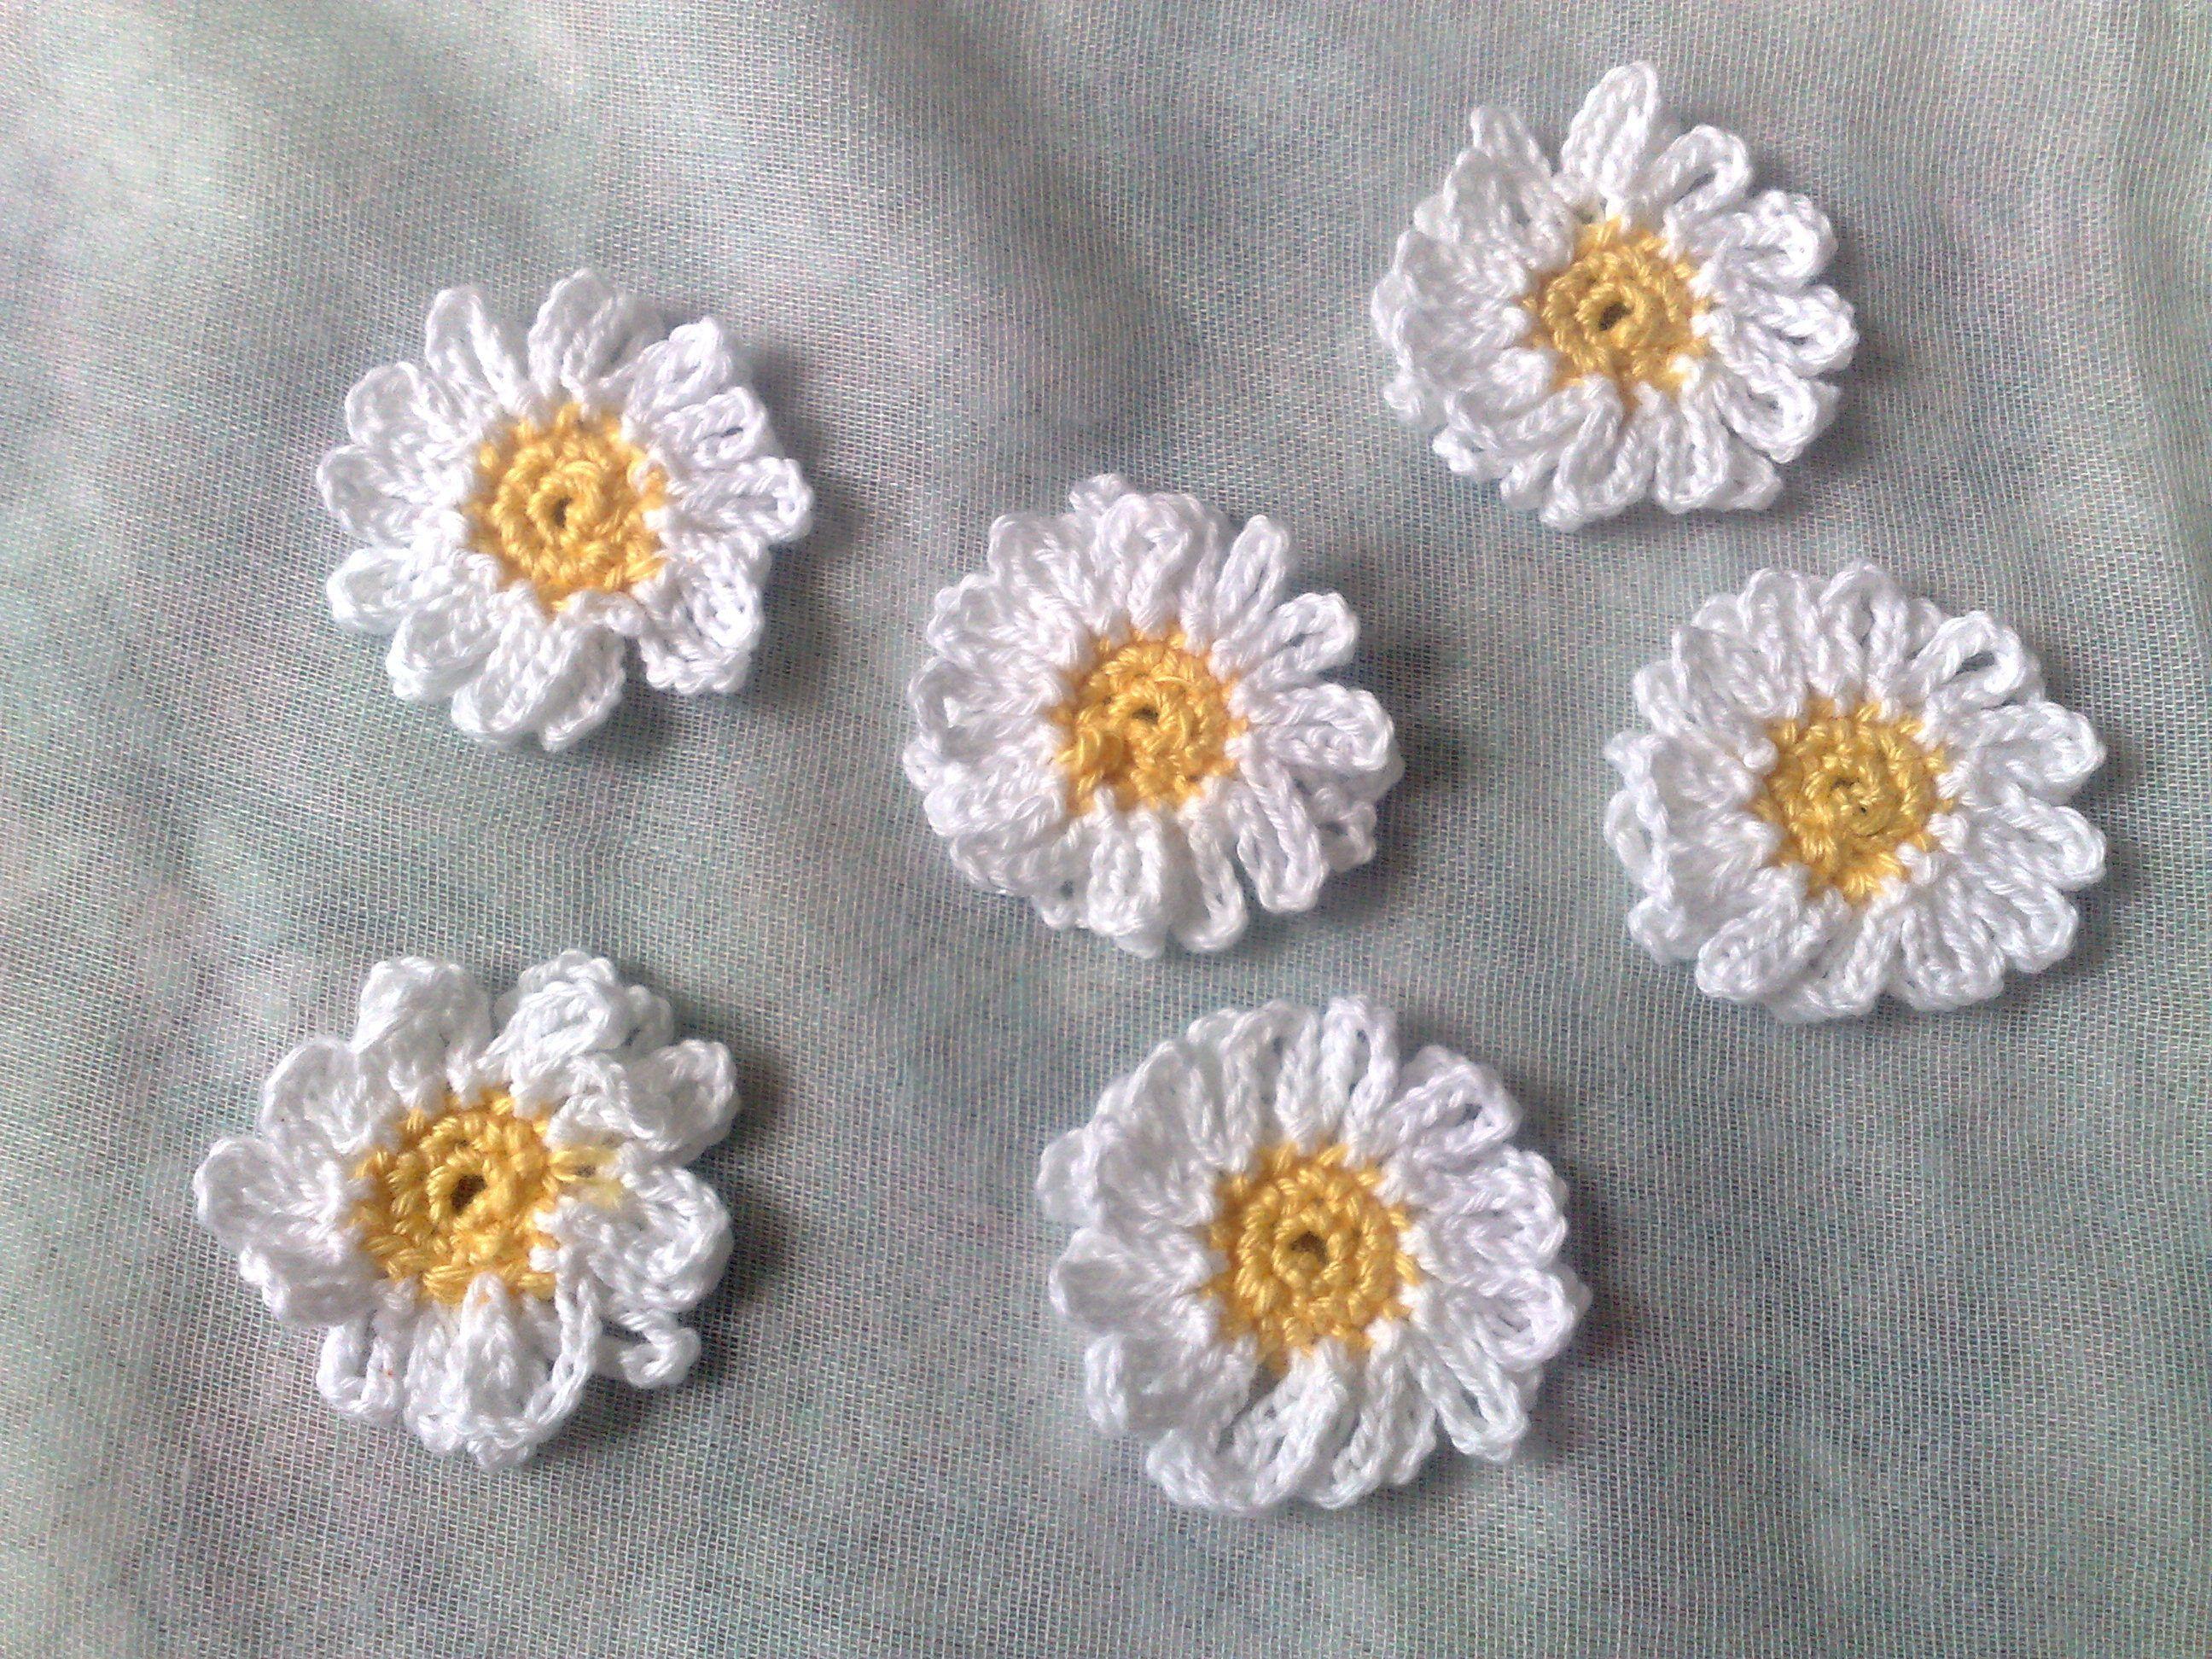 Hängend Hohl Blume Fallen Haken Ohrringe Mohn Blütenblätter Gänseblümchen 925